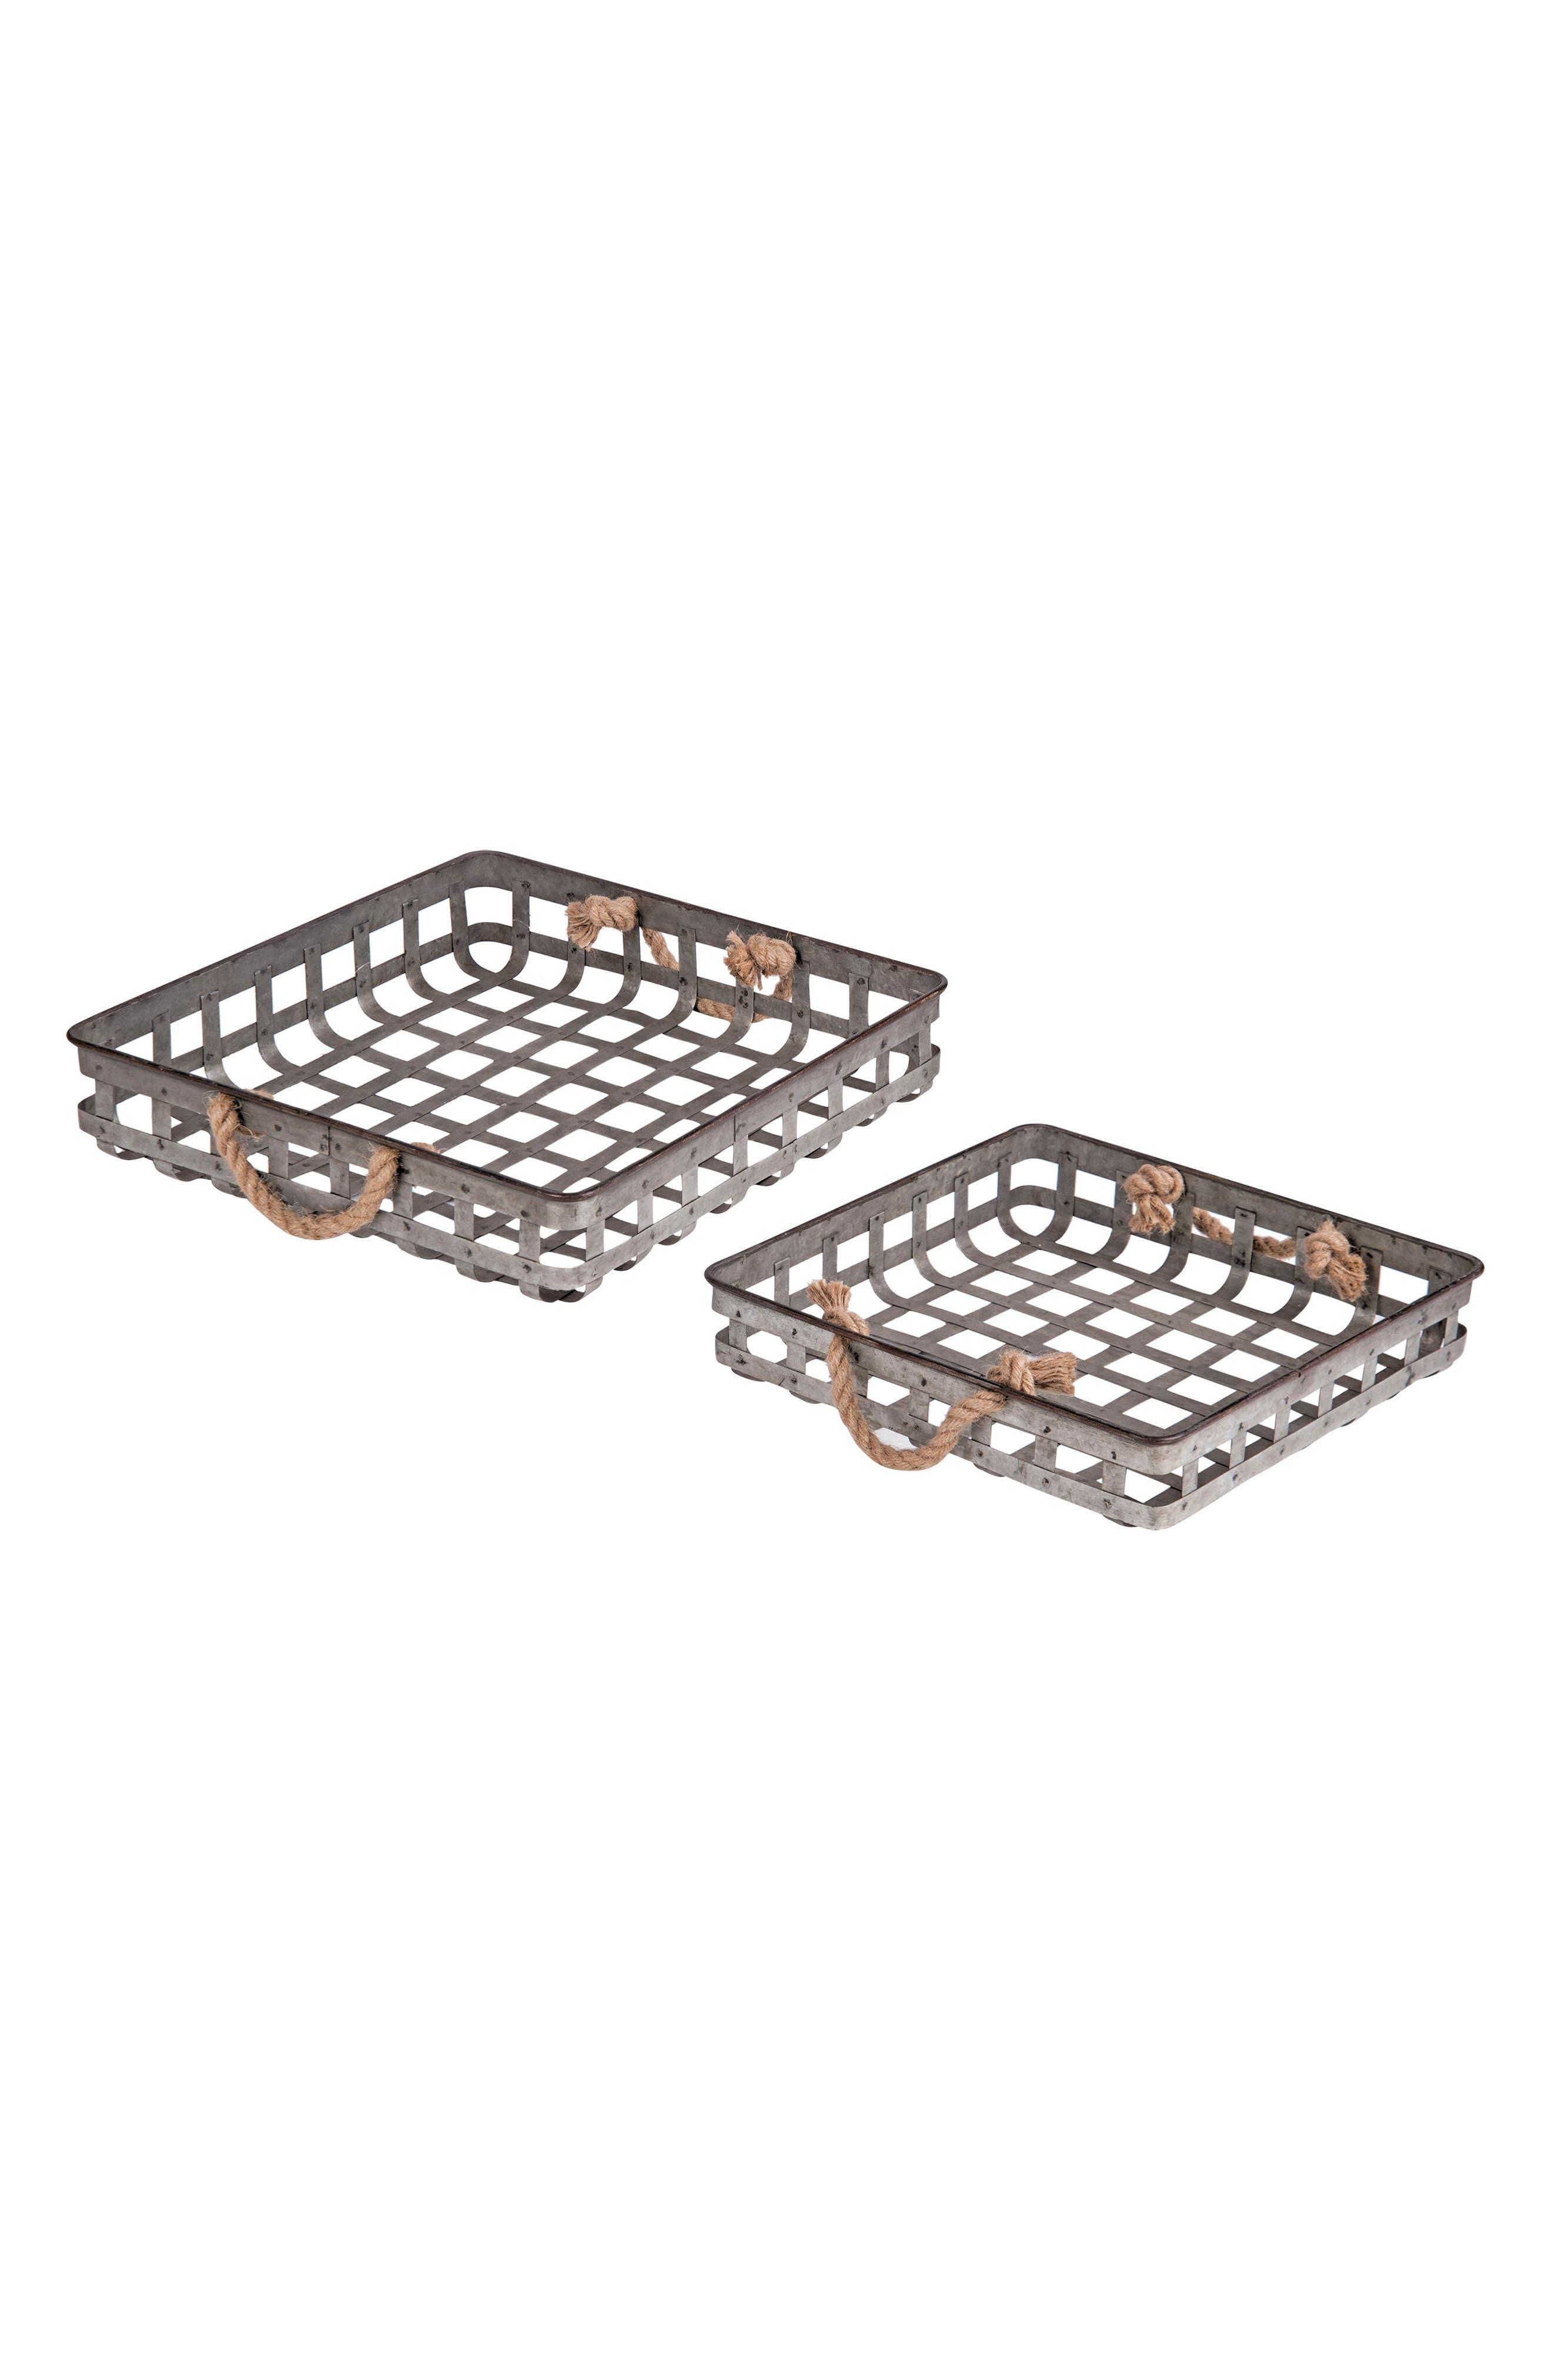 Set of 2 Nesting Basket Trays,                             Main thumbnail 1, color,